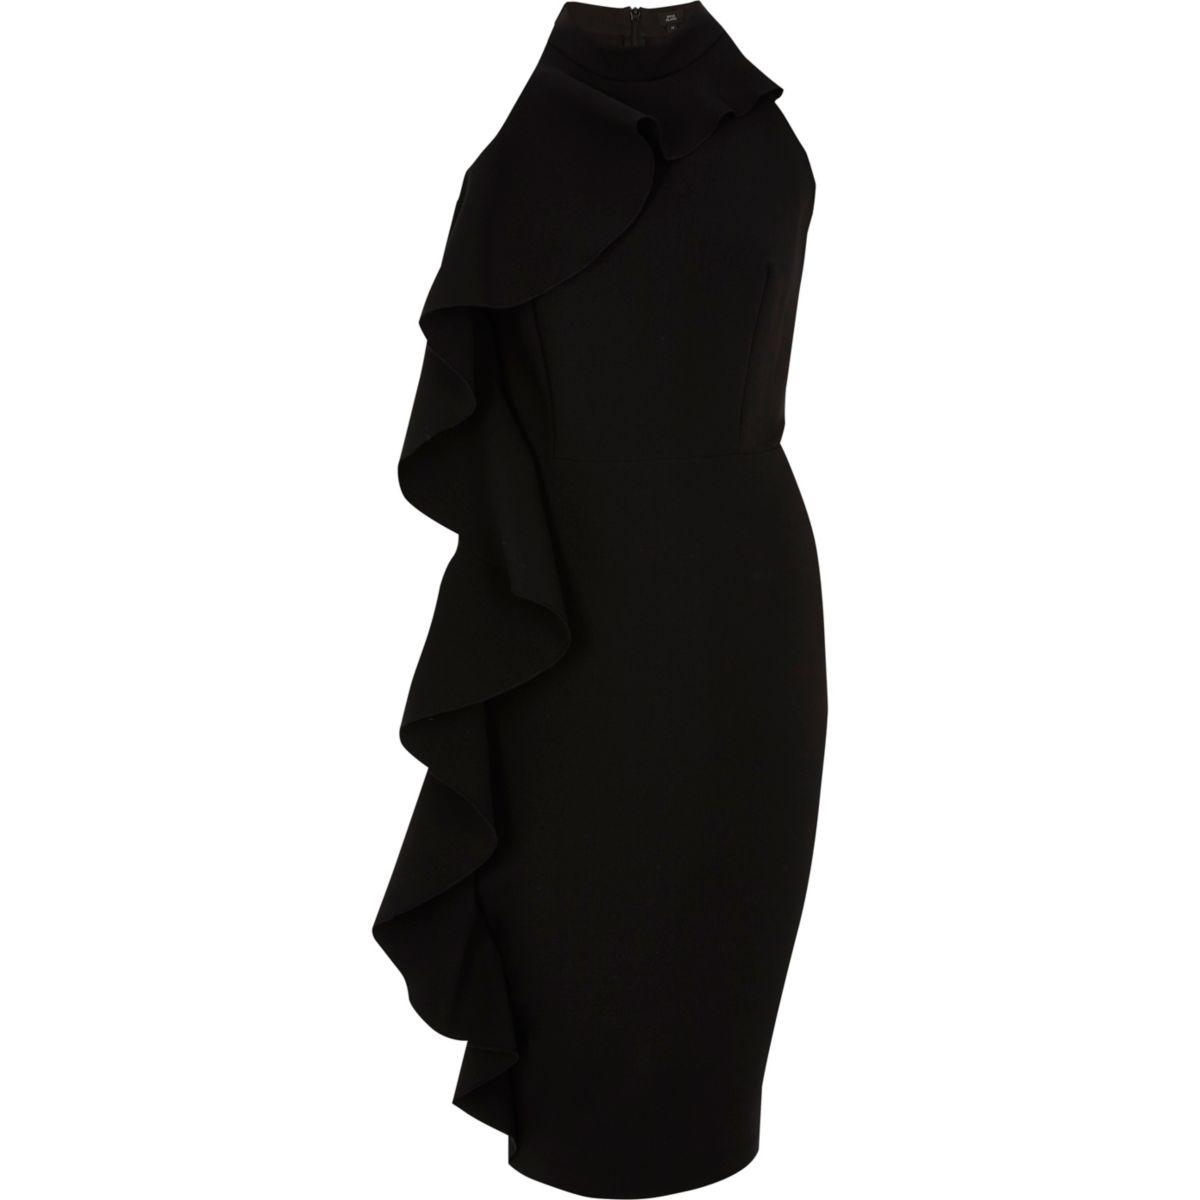 Black frill side sleeveless bodycon dress